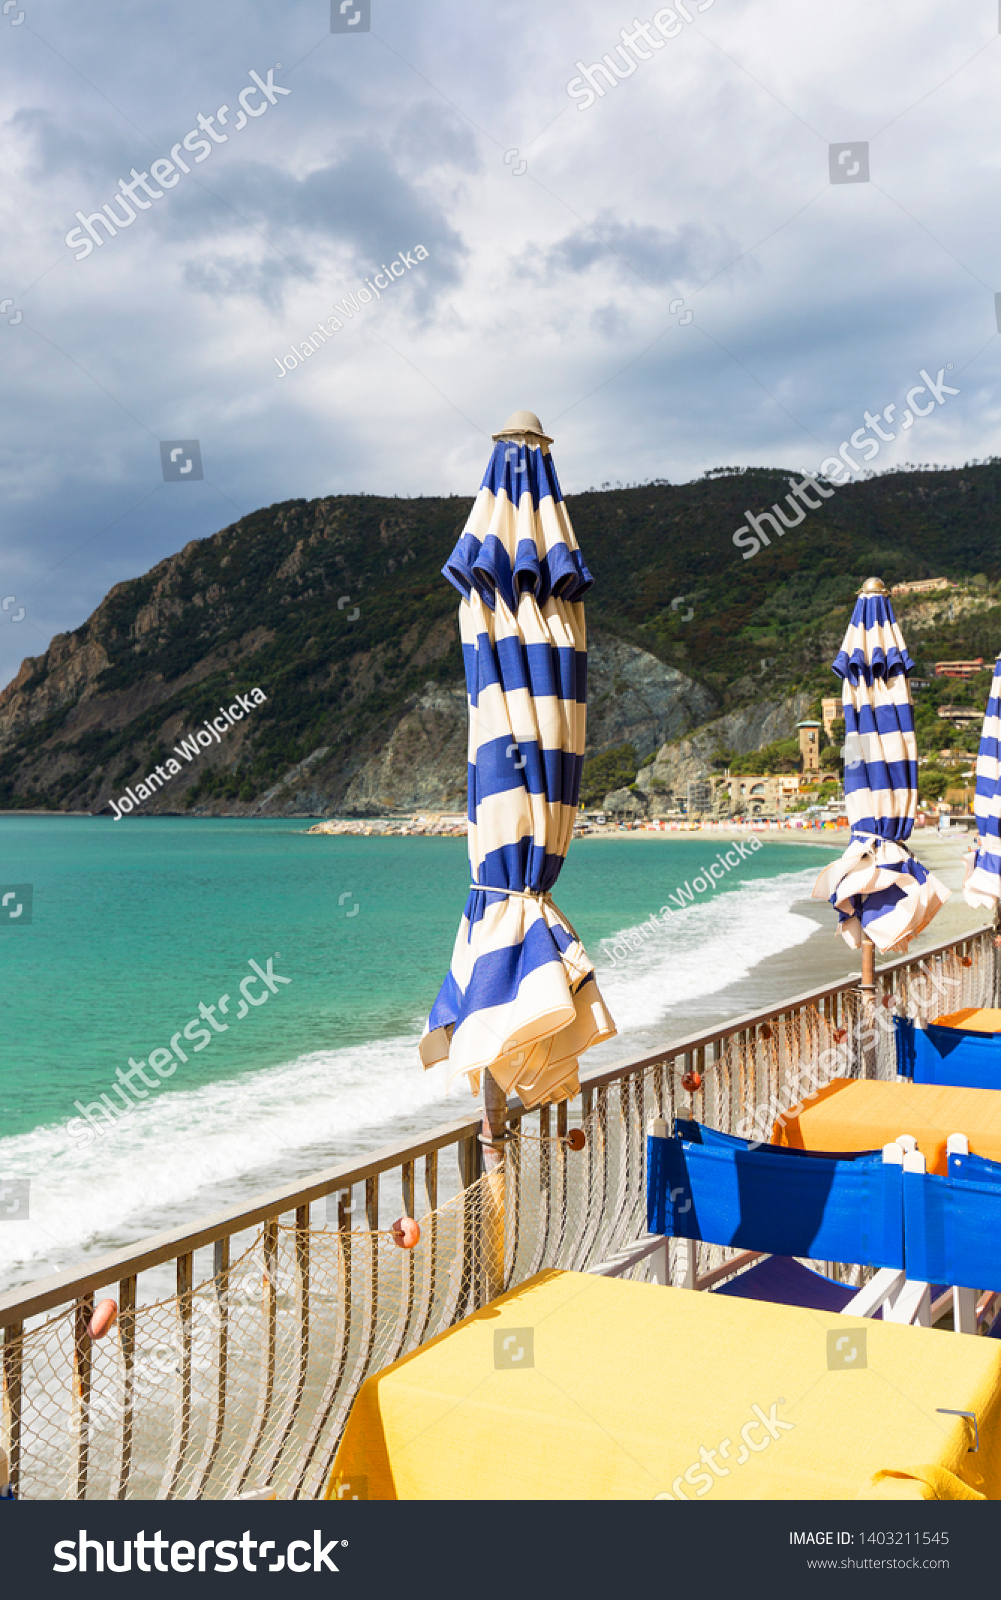 View On Beach Sea Restaurant Turquoise Stock Photo Edit Now 1403211545